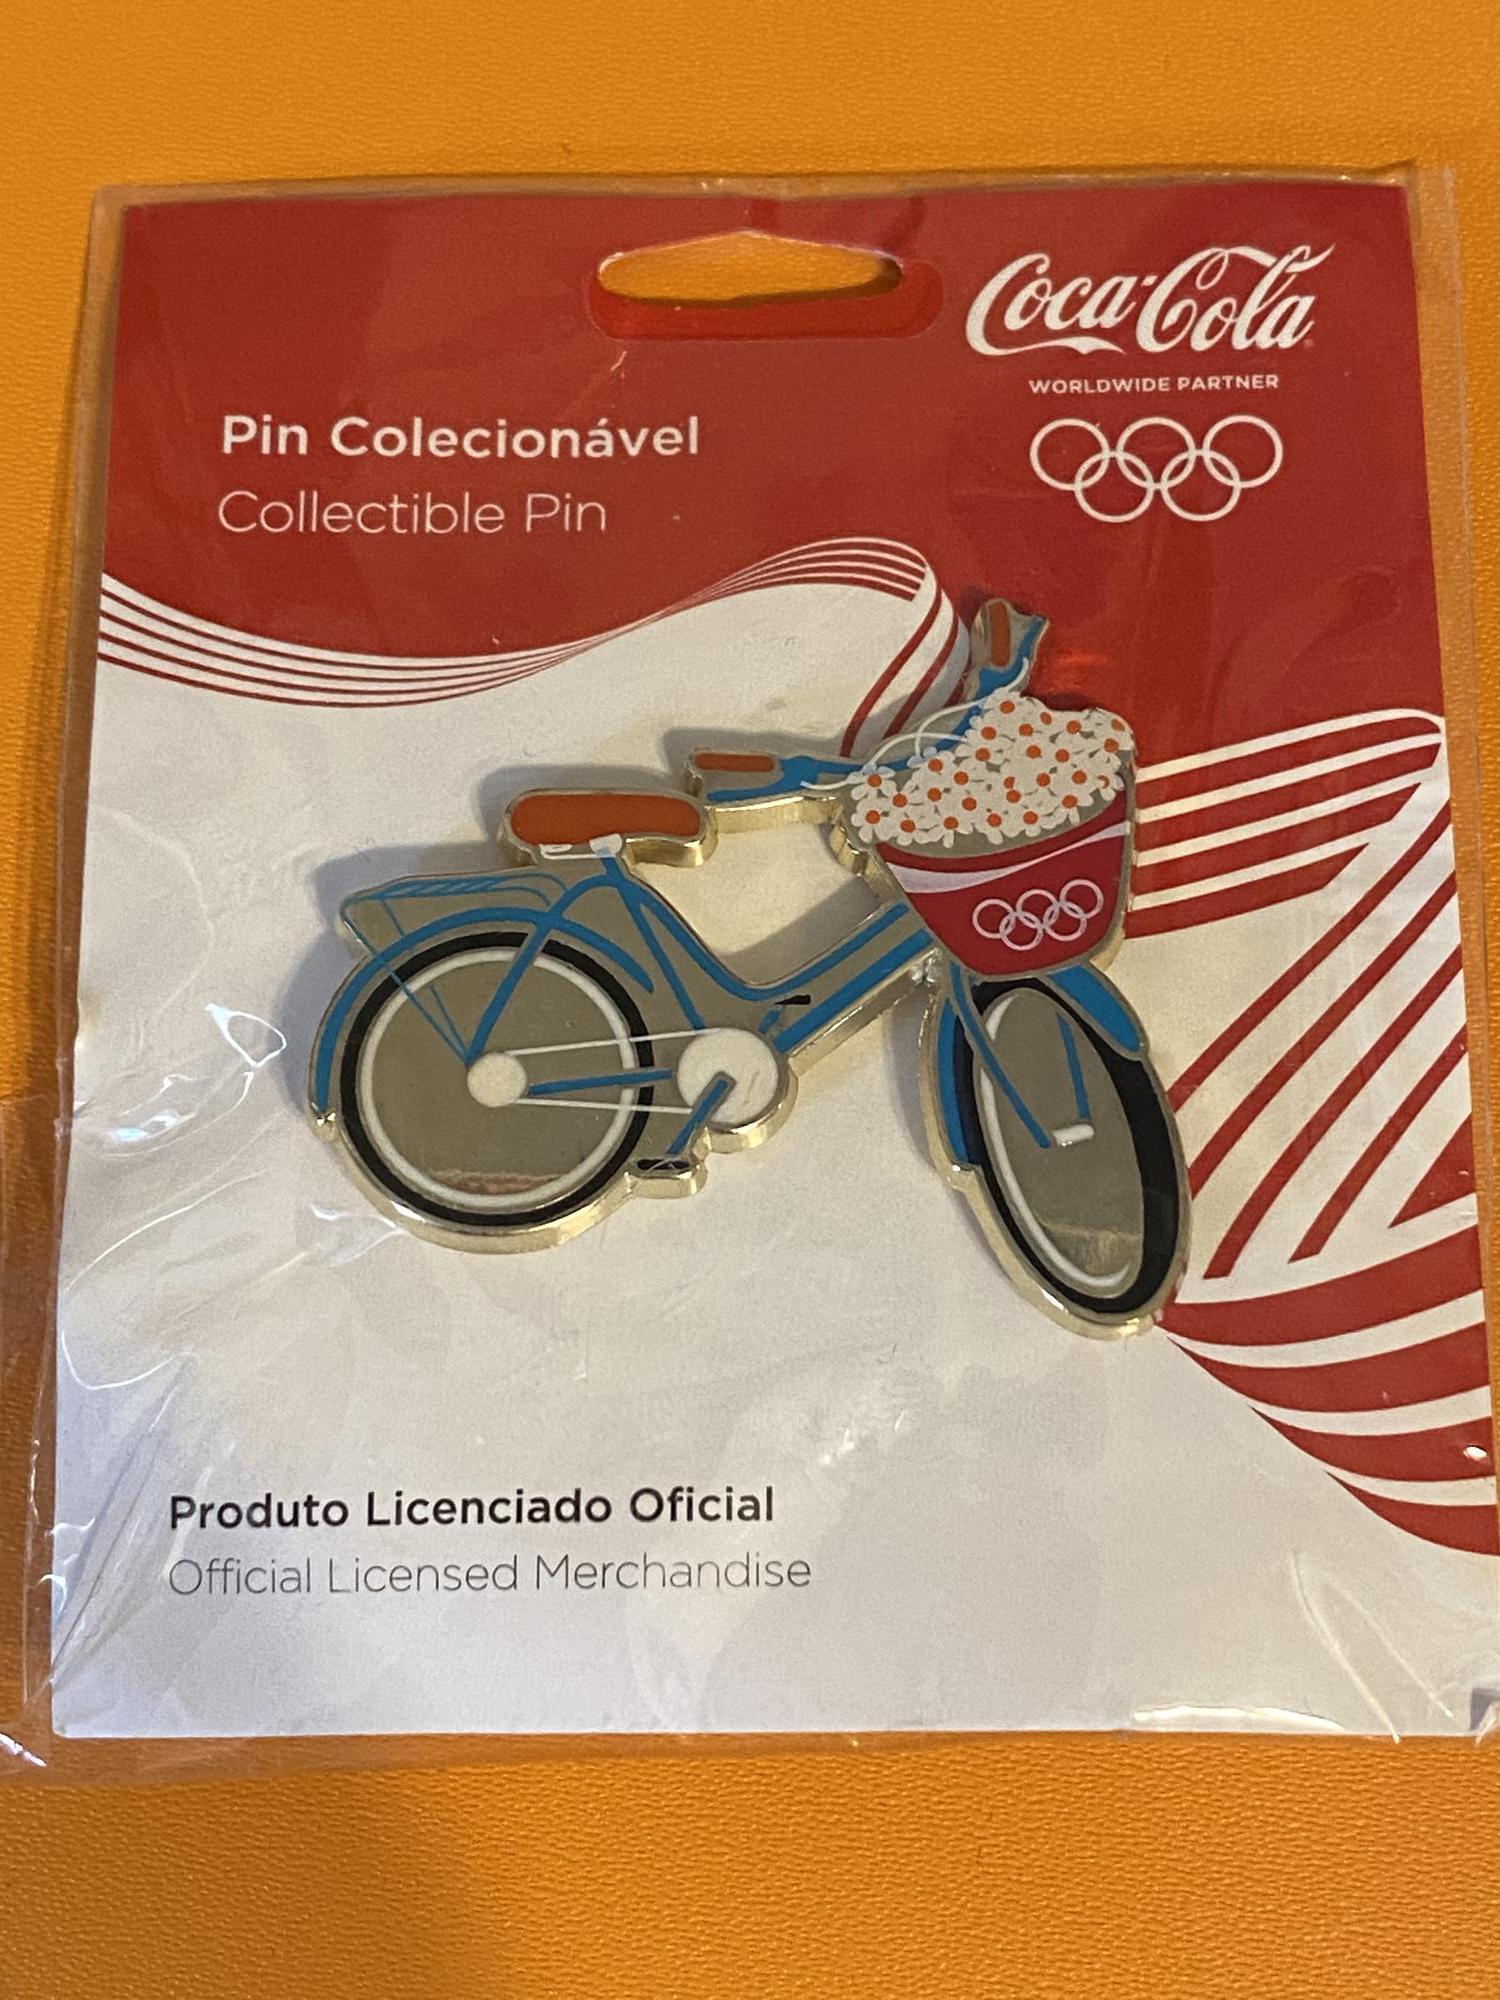 Coca-Cola (Coke) Rio 2016 Bicycle Pin